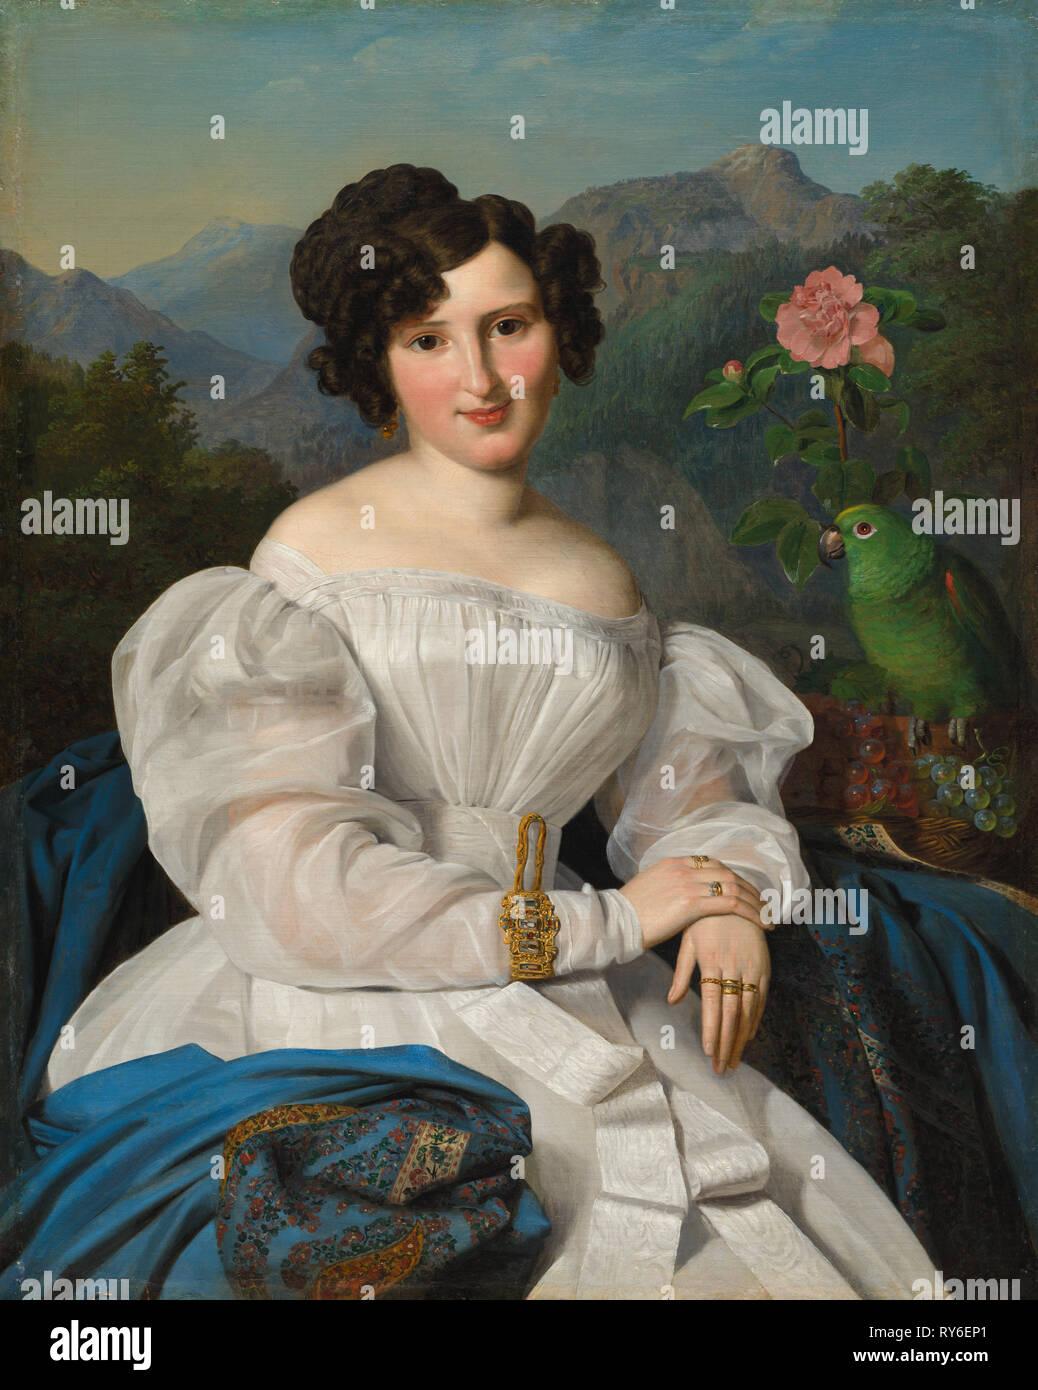 Countess Széchenyi, 1828. Ferdinand Georg Waldmüller (Austrian, 1793-1865). Oil on fabric; framed: 121.5 x 102 x 10.5 cm (47 13/16 x 40 3/16 x 4 1/8 in.); unframed: 97.8 x 78.5 cm (38 1/2 x 30 7/8 in - Stock Image